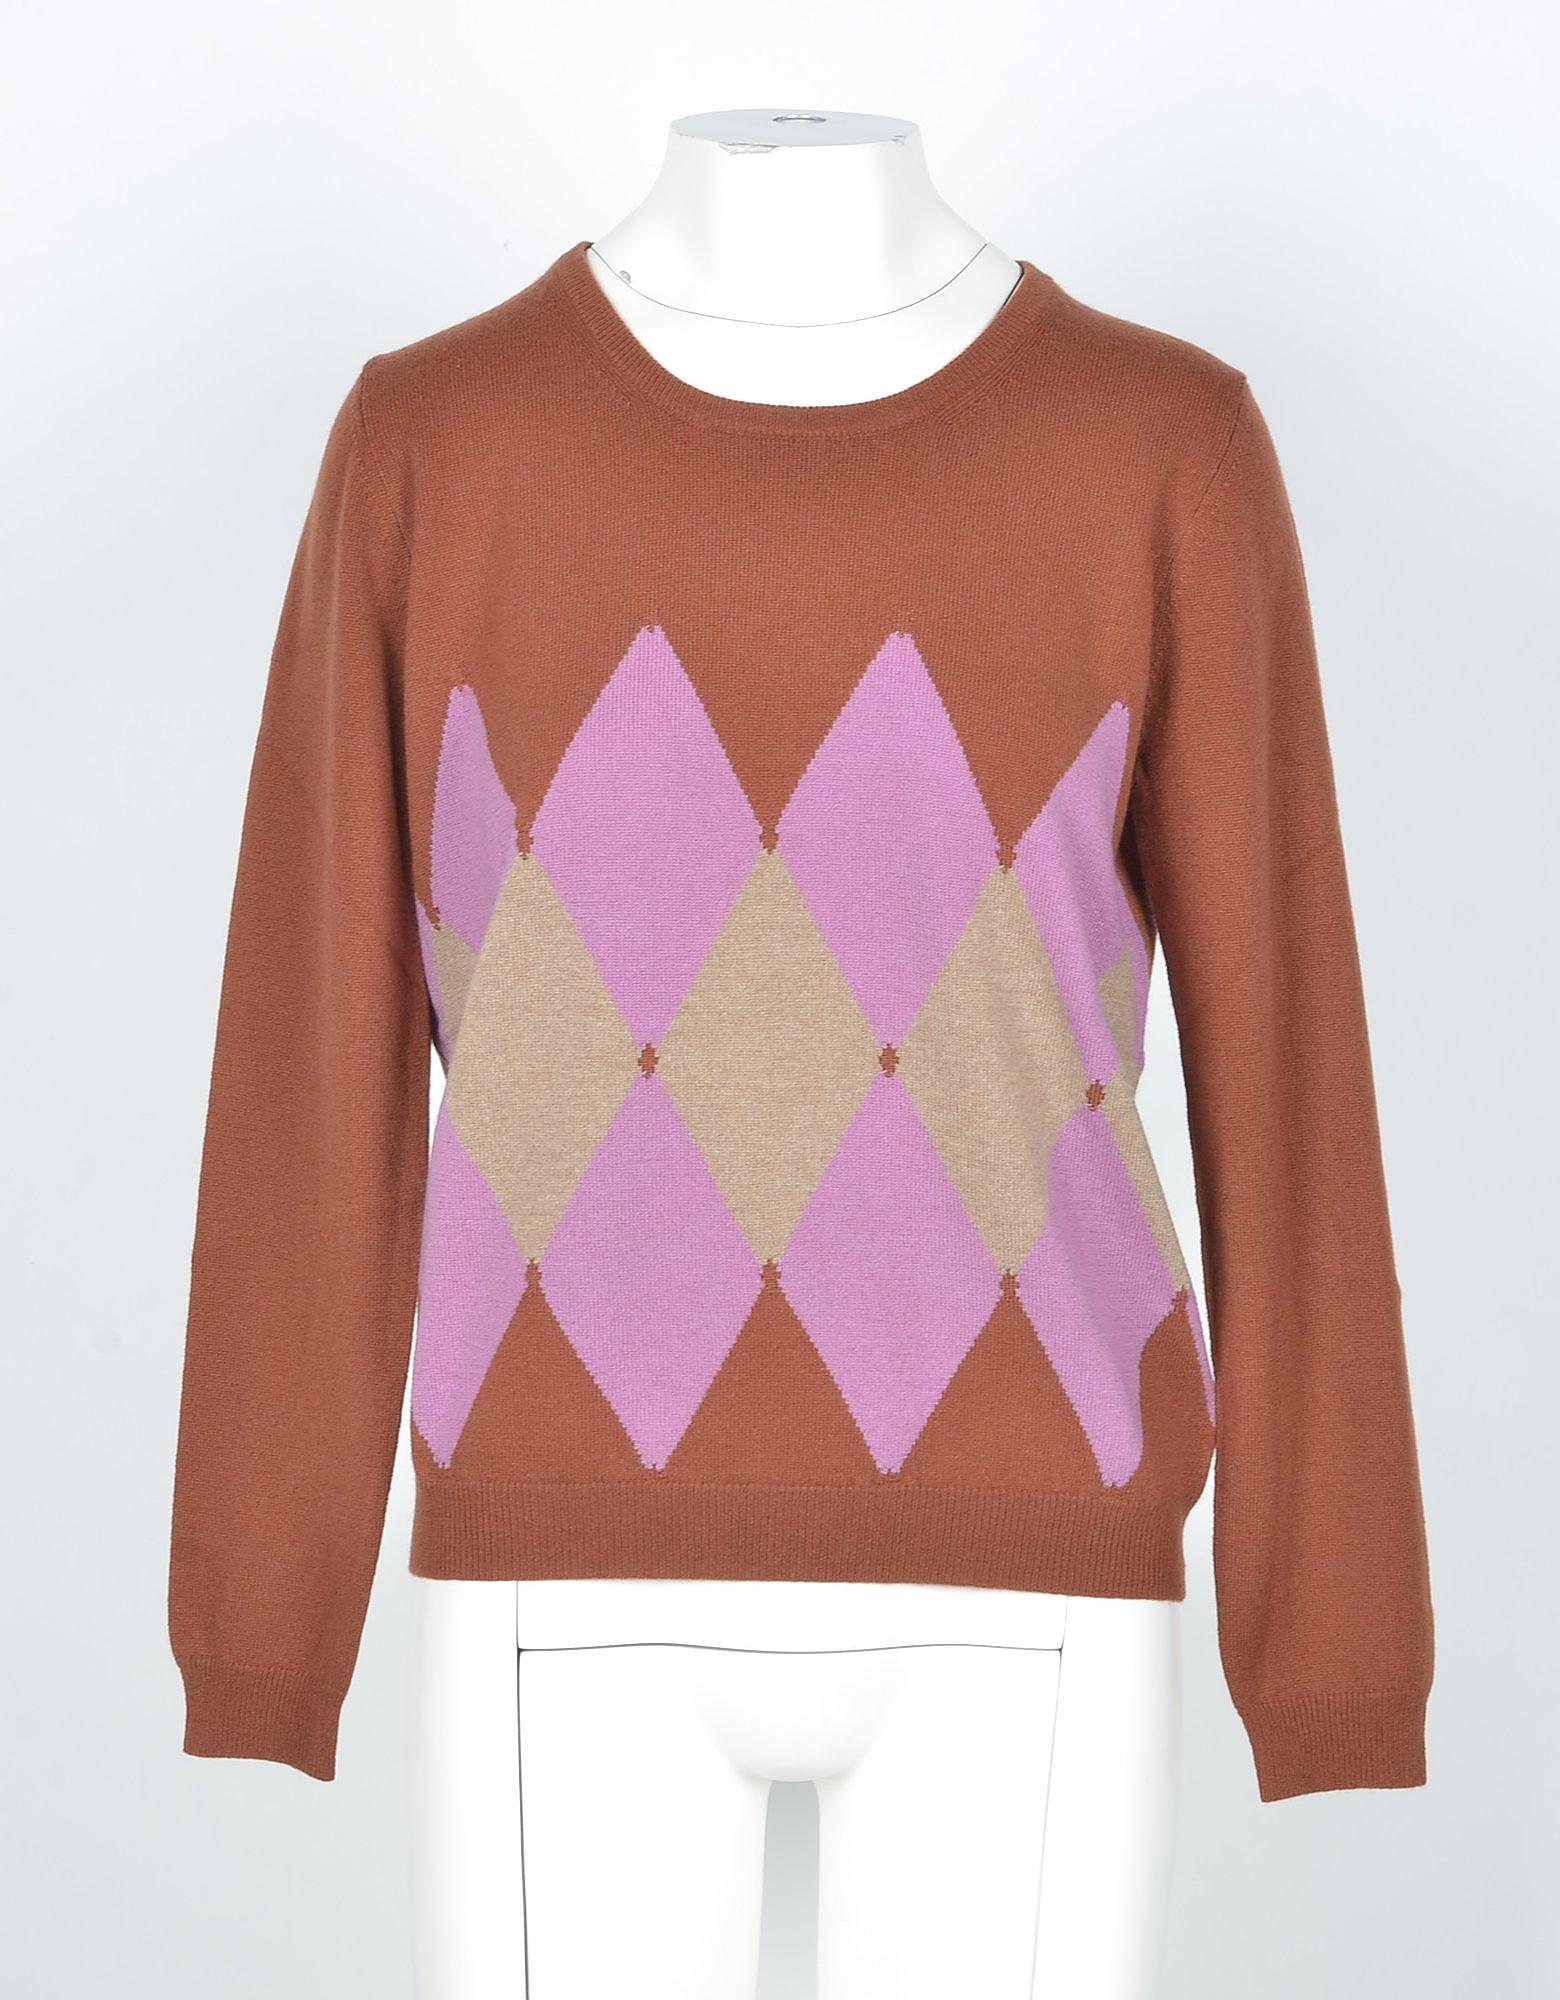 Ballantyne Designer Knitwear, Rust/Beige Cashmere Argyle Women's Sweater